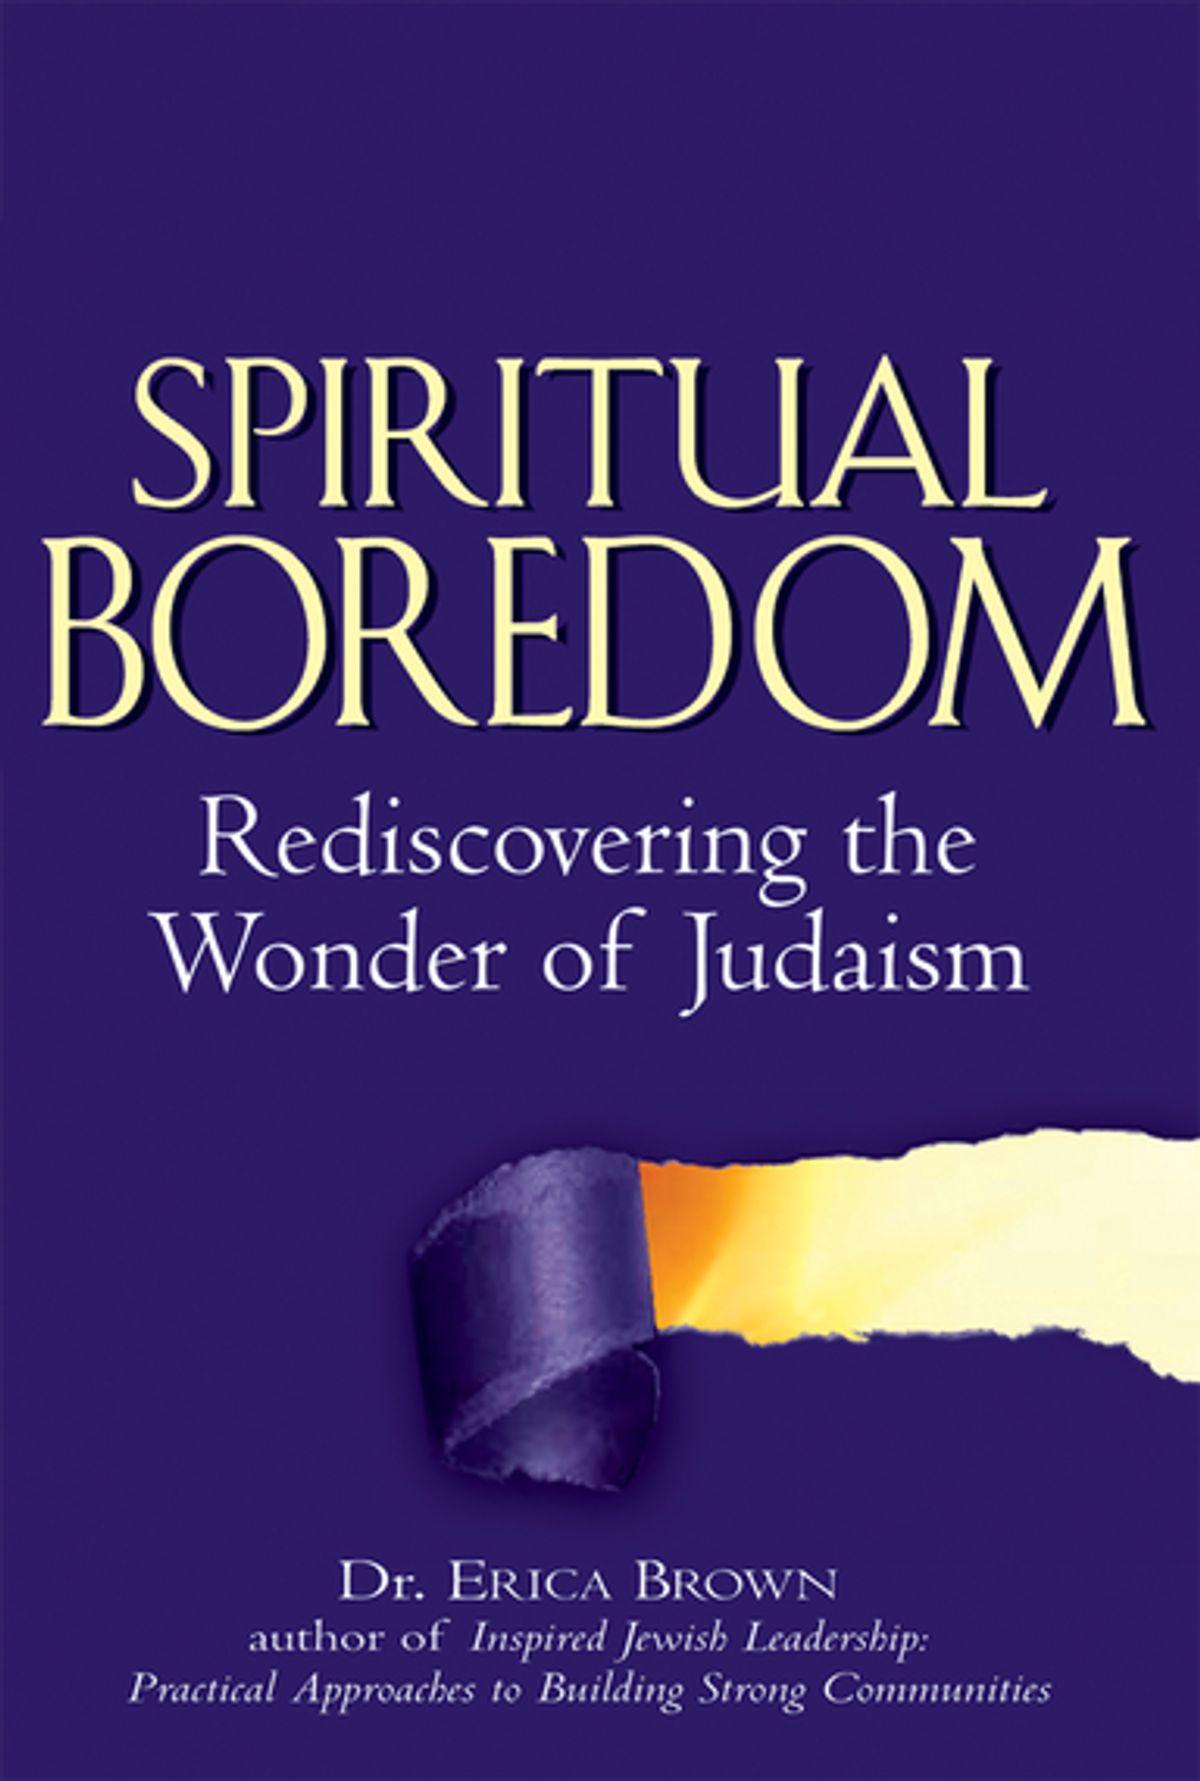 spiritual-boredom.jpg